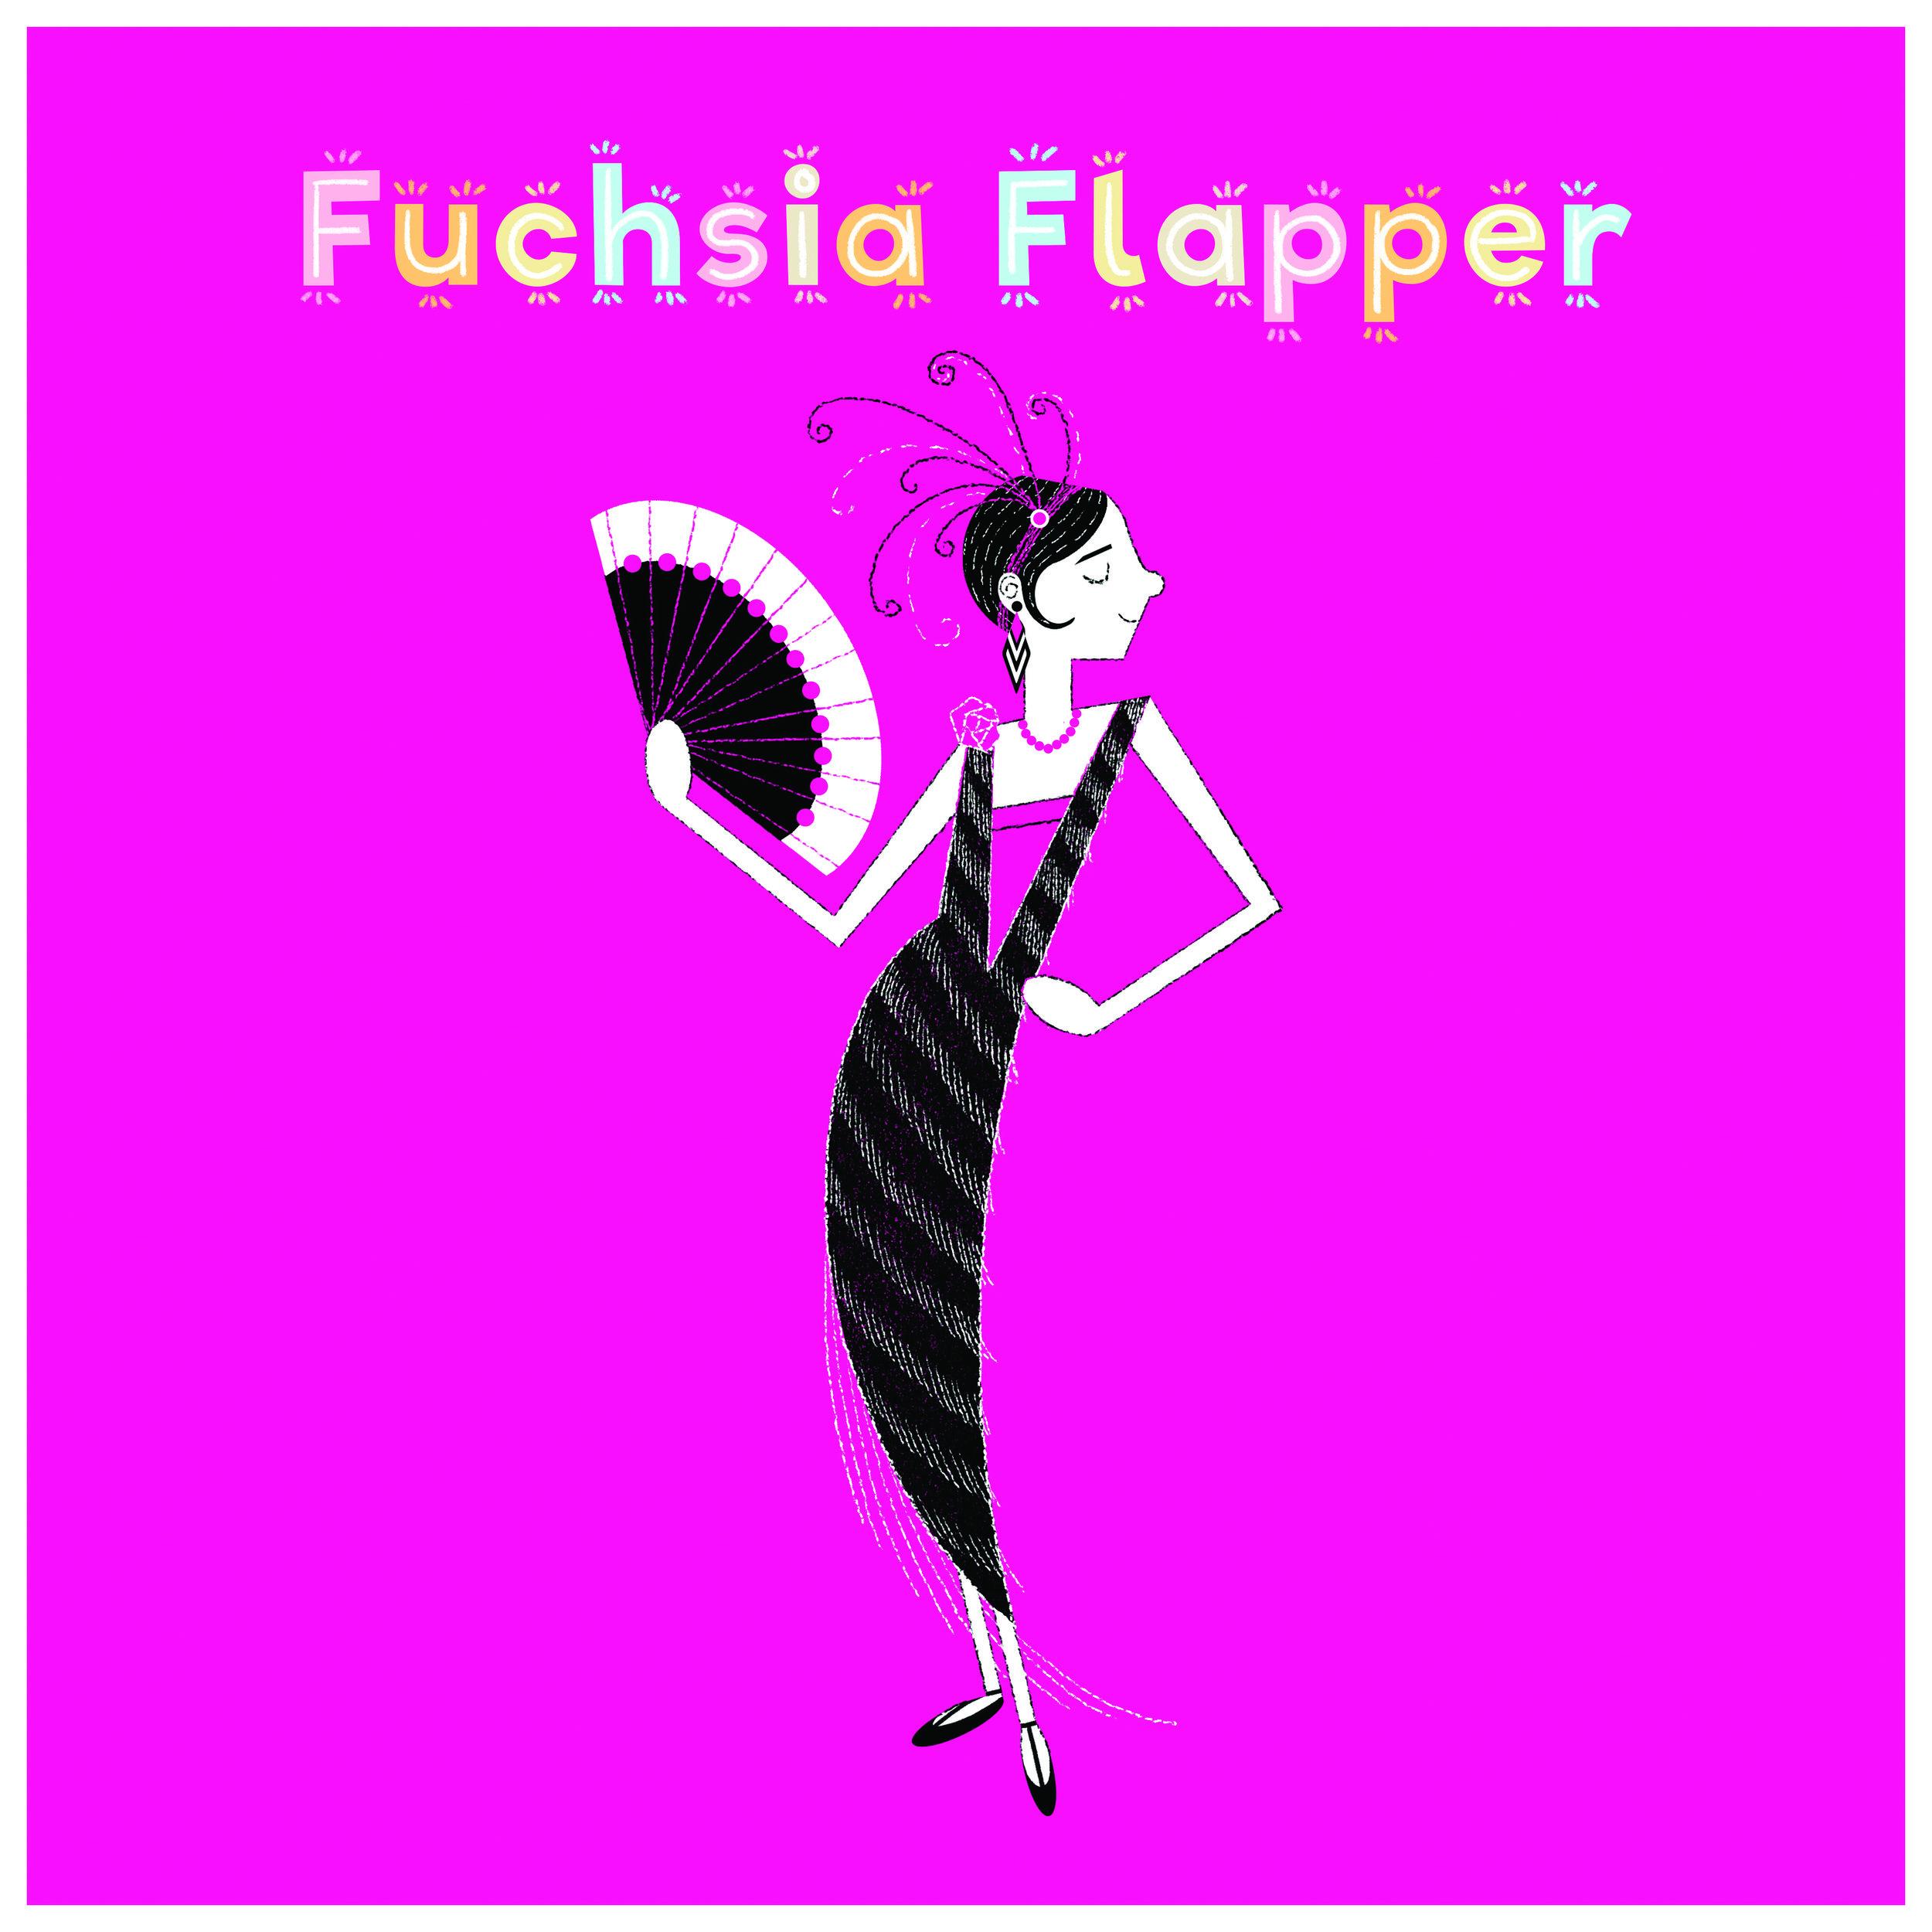 Art_Memory_Game_Cards_Fuchsia_Flapper_CMYK.jpg